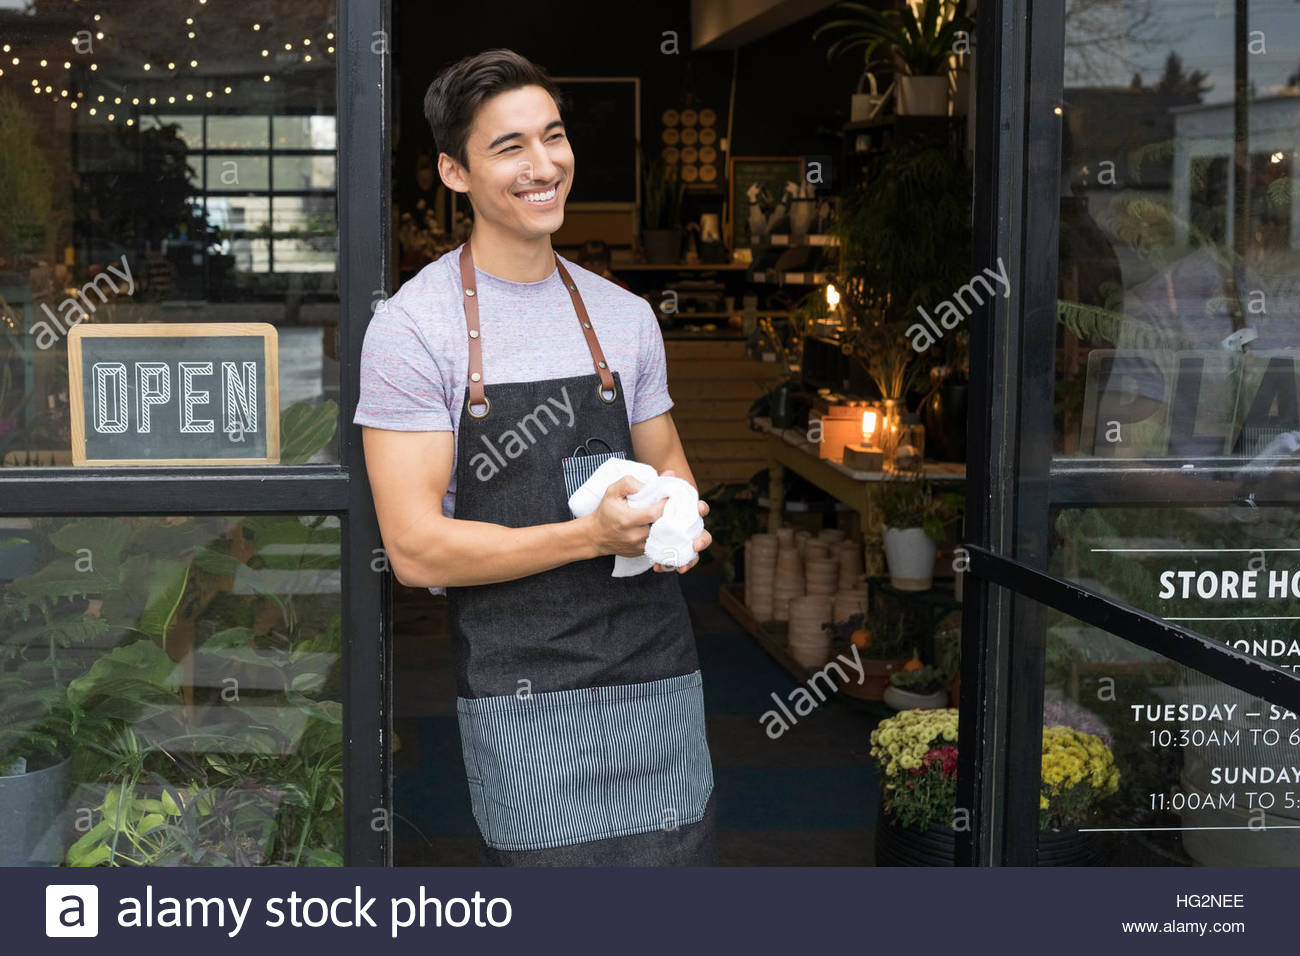 Smiling male shop owner looking away in doorway Stock Photo